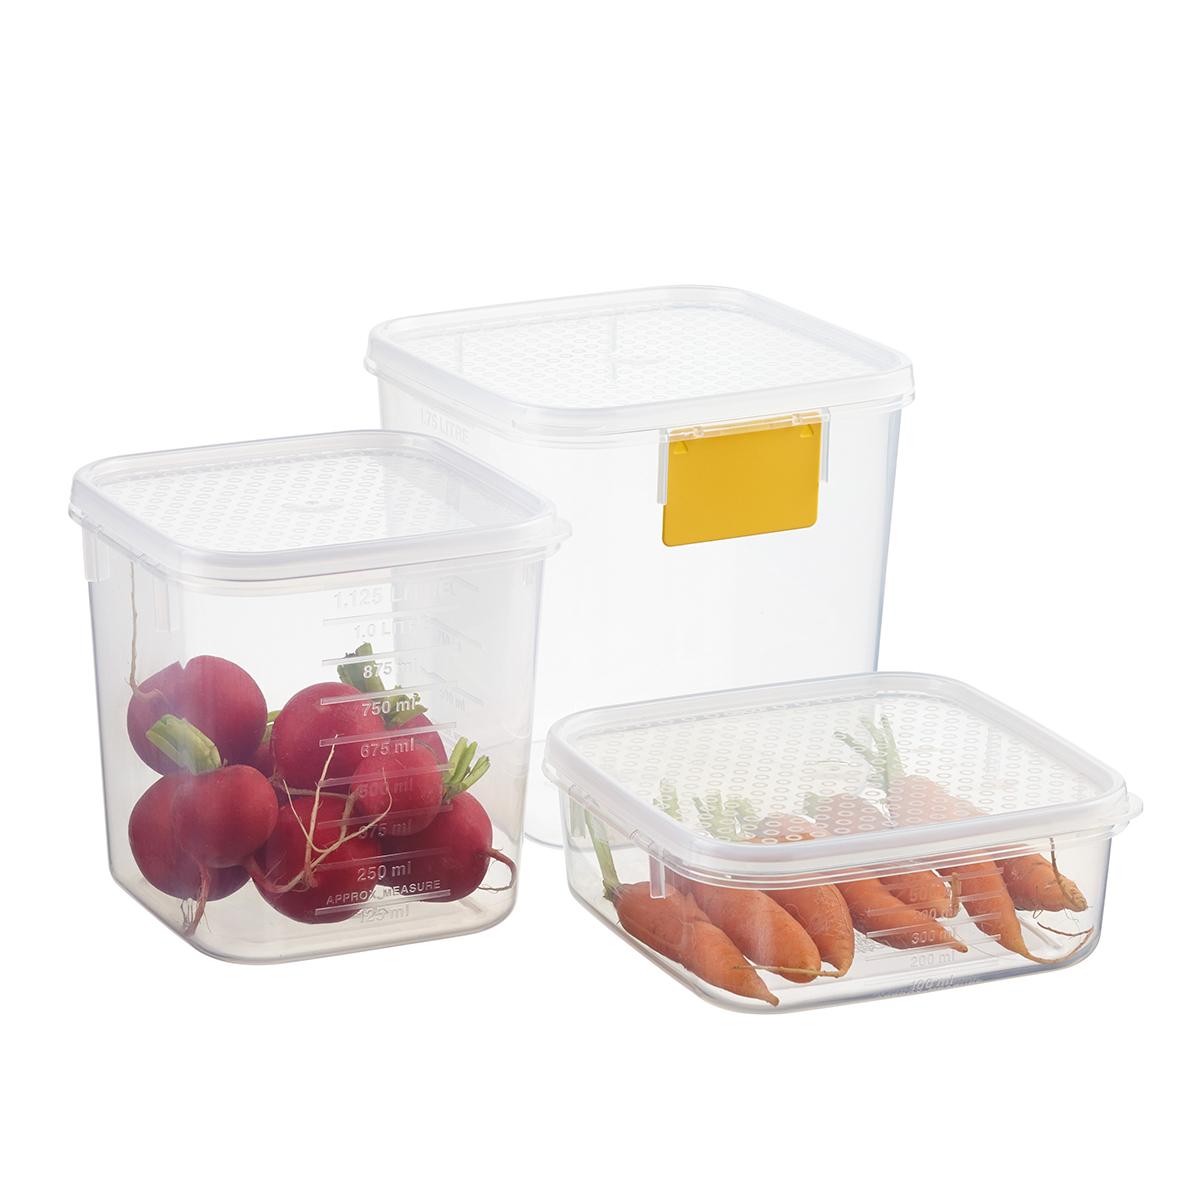 Tellfresh Square Food Storage  sc 1 st  The Container Store & Tellfresh Square Food Storage | The Container Store